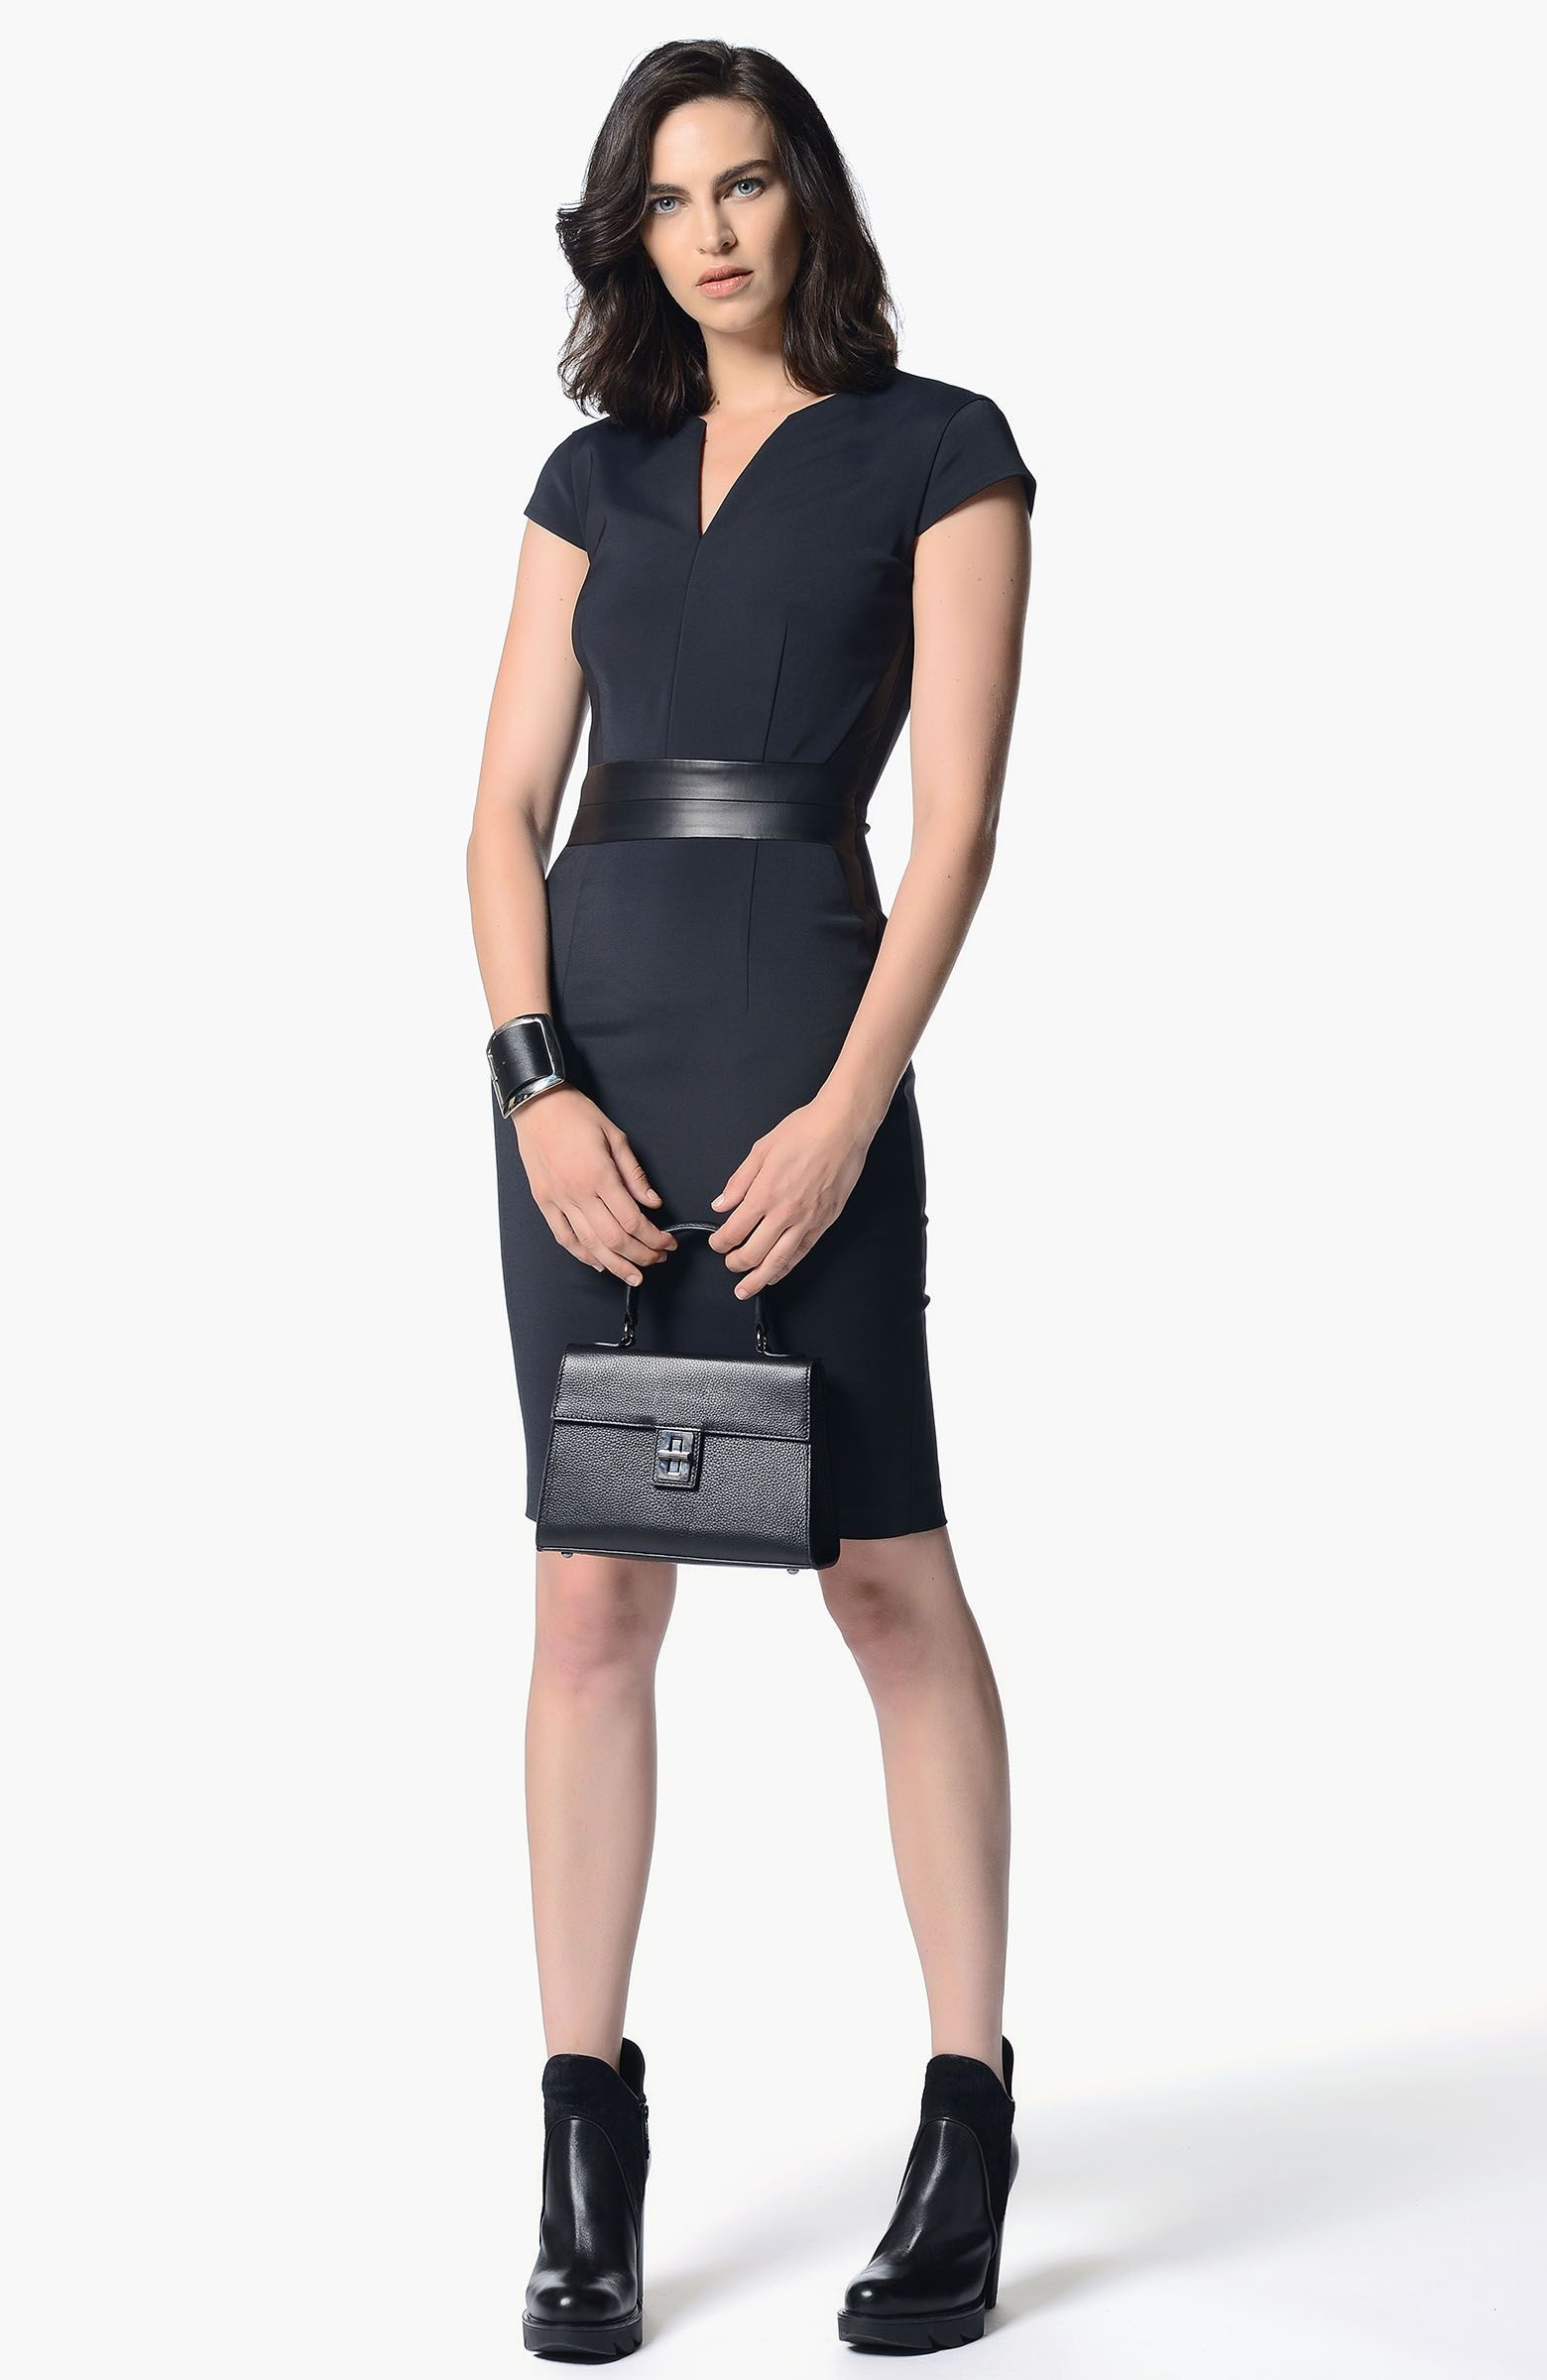 d22ee985eec0a Network Yaka Siyah Elbise | KONSEPT, kadın, klasik | Siyah elbise ...